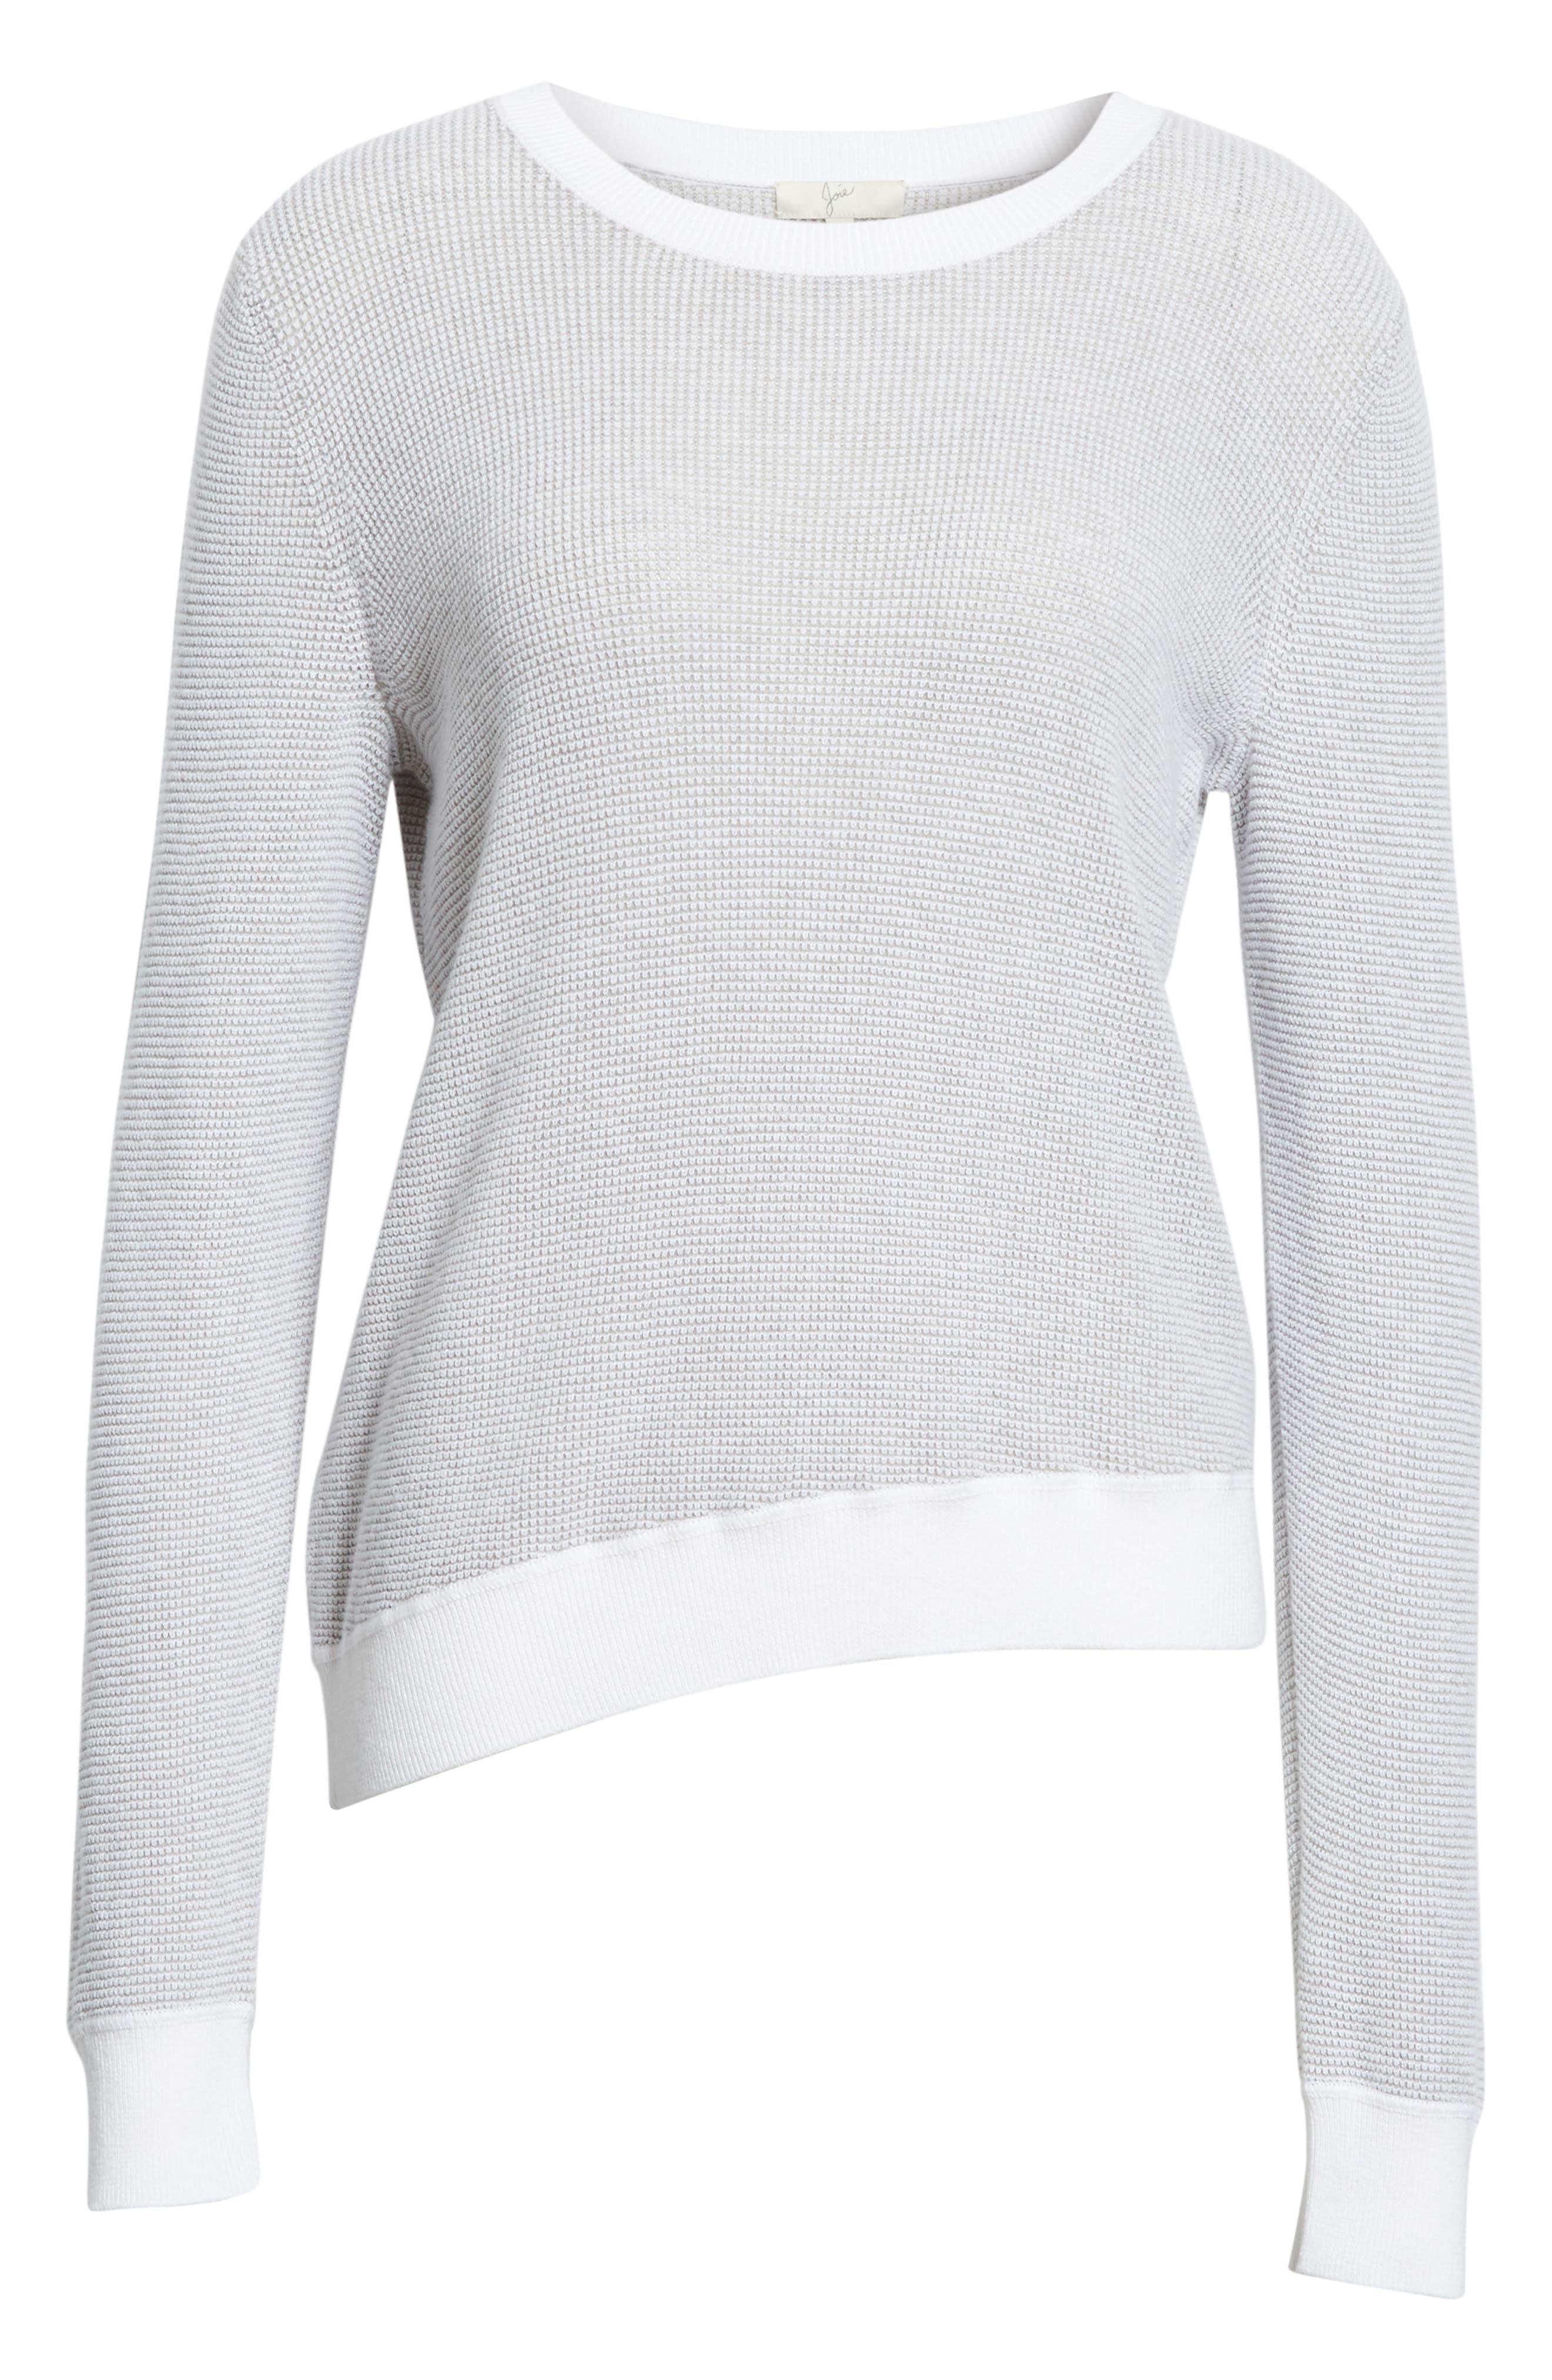 Laurana Cotton & Cashmere Sweater,                             Alternate thumbnail 6, color,